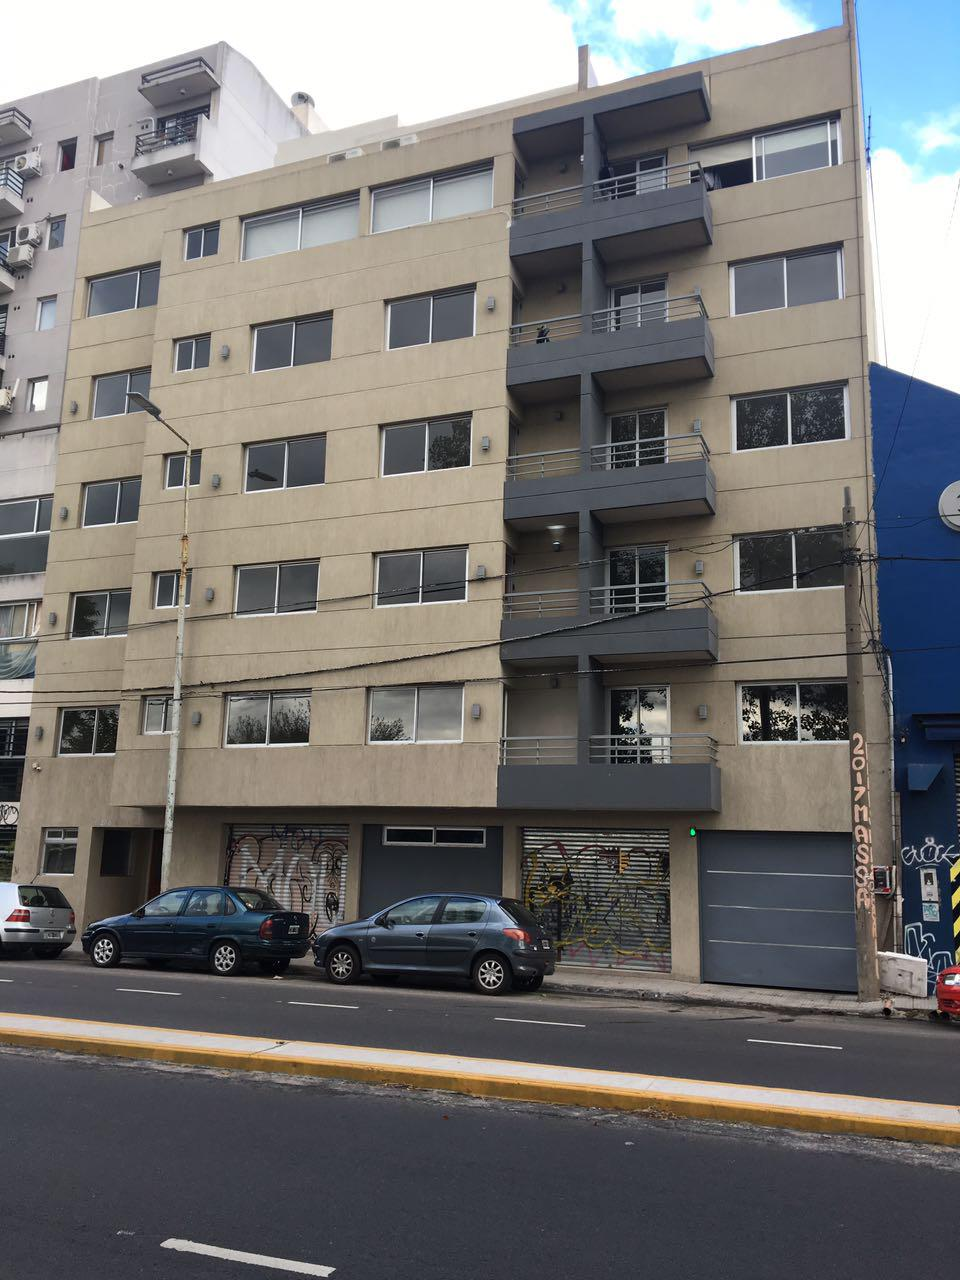 Foto Departamento en Venta |  en  Haedo,  Moron  Avenida Rivadavia al 15200